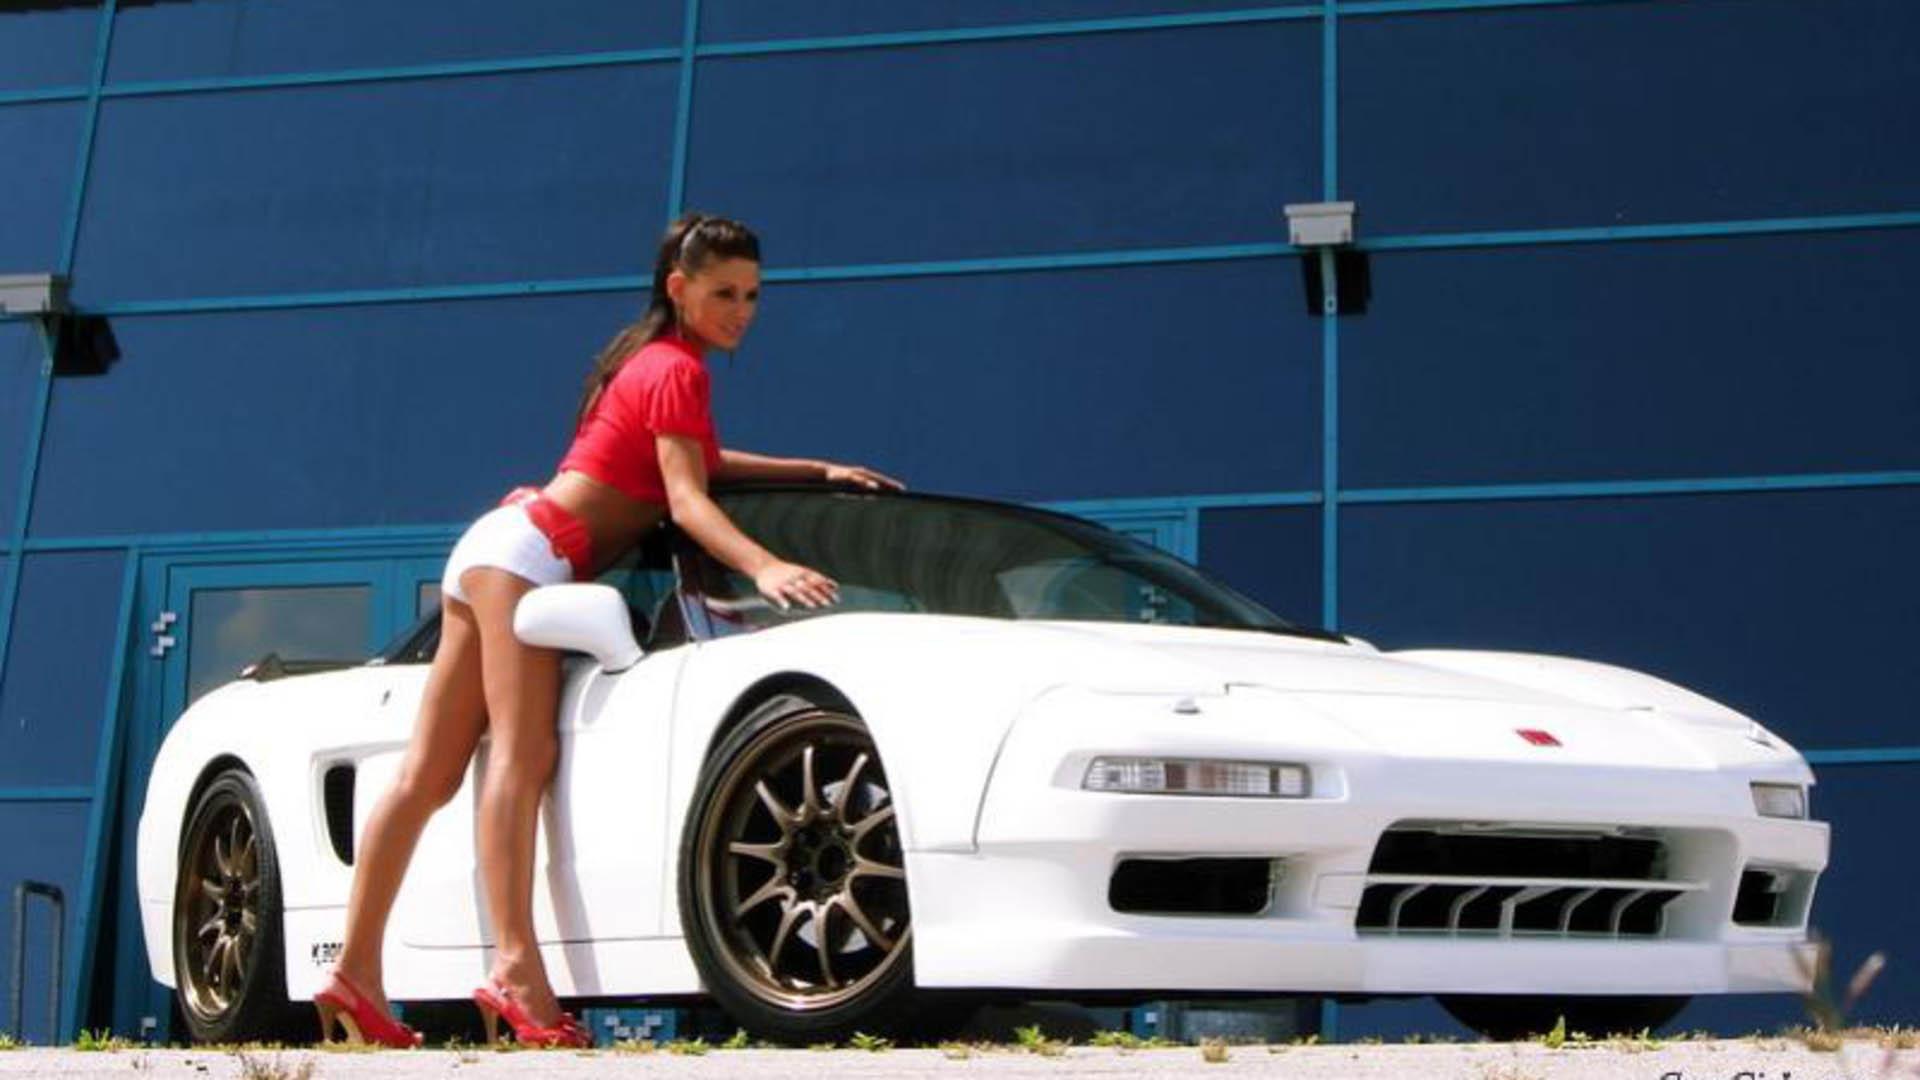 Hot Girl With Car Wallpaper 13   SA Wallpapers 1920x1080